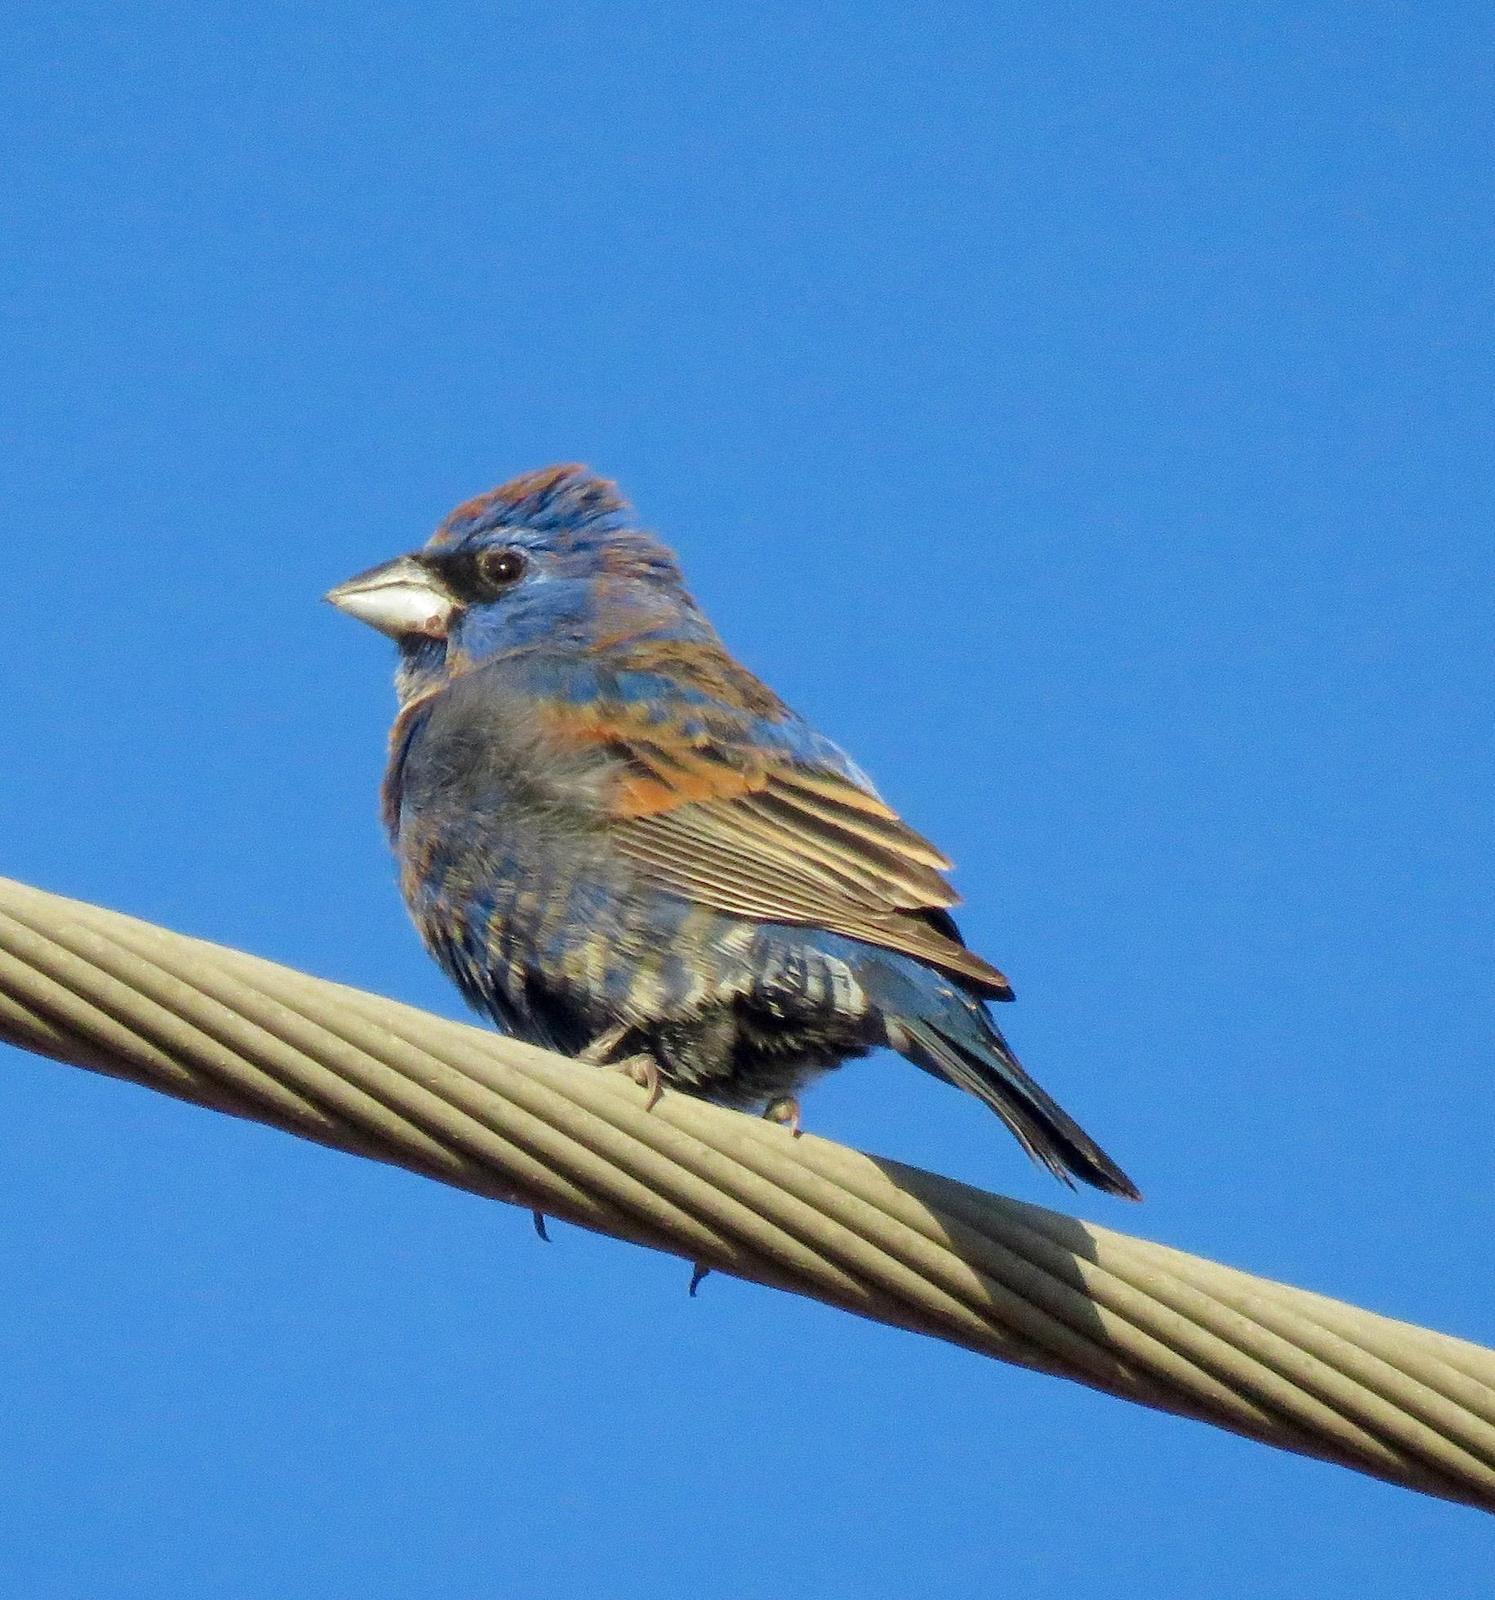 Blue Grosbeak Photo by Don Glasco